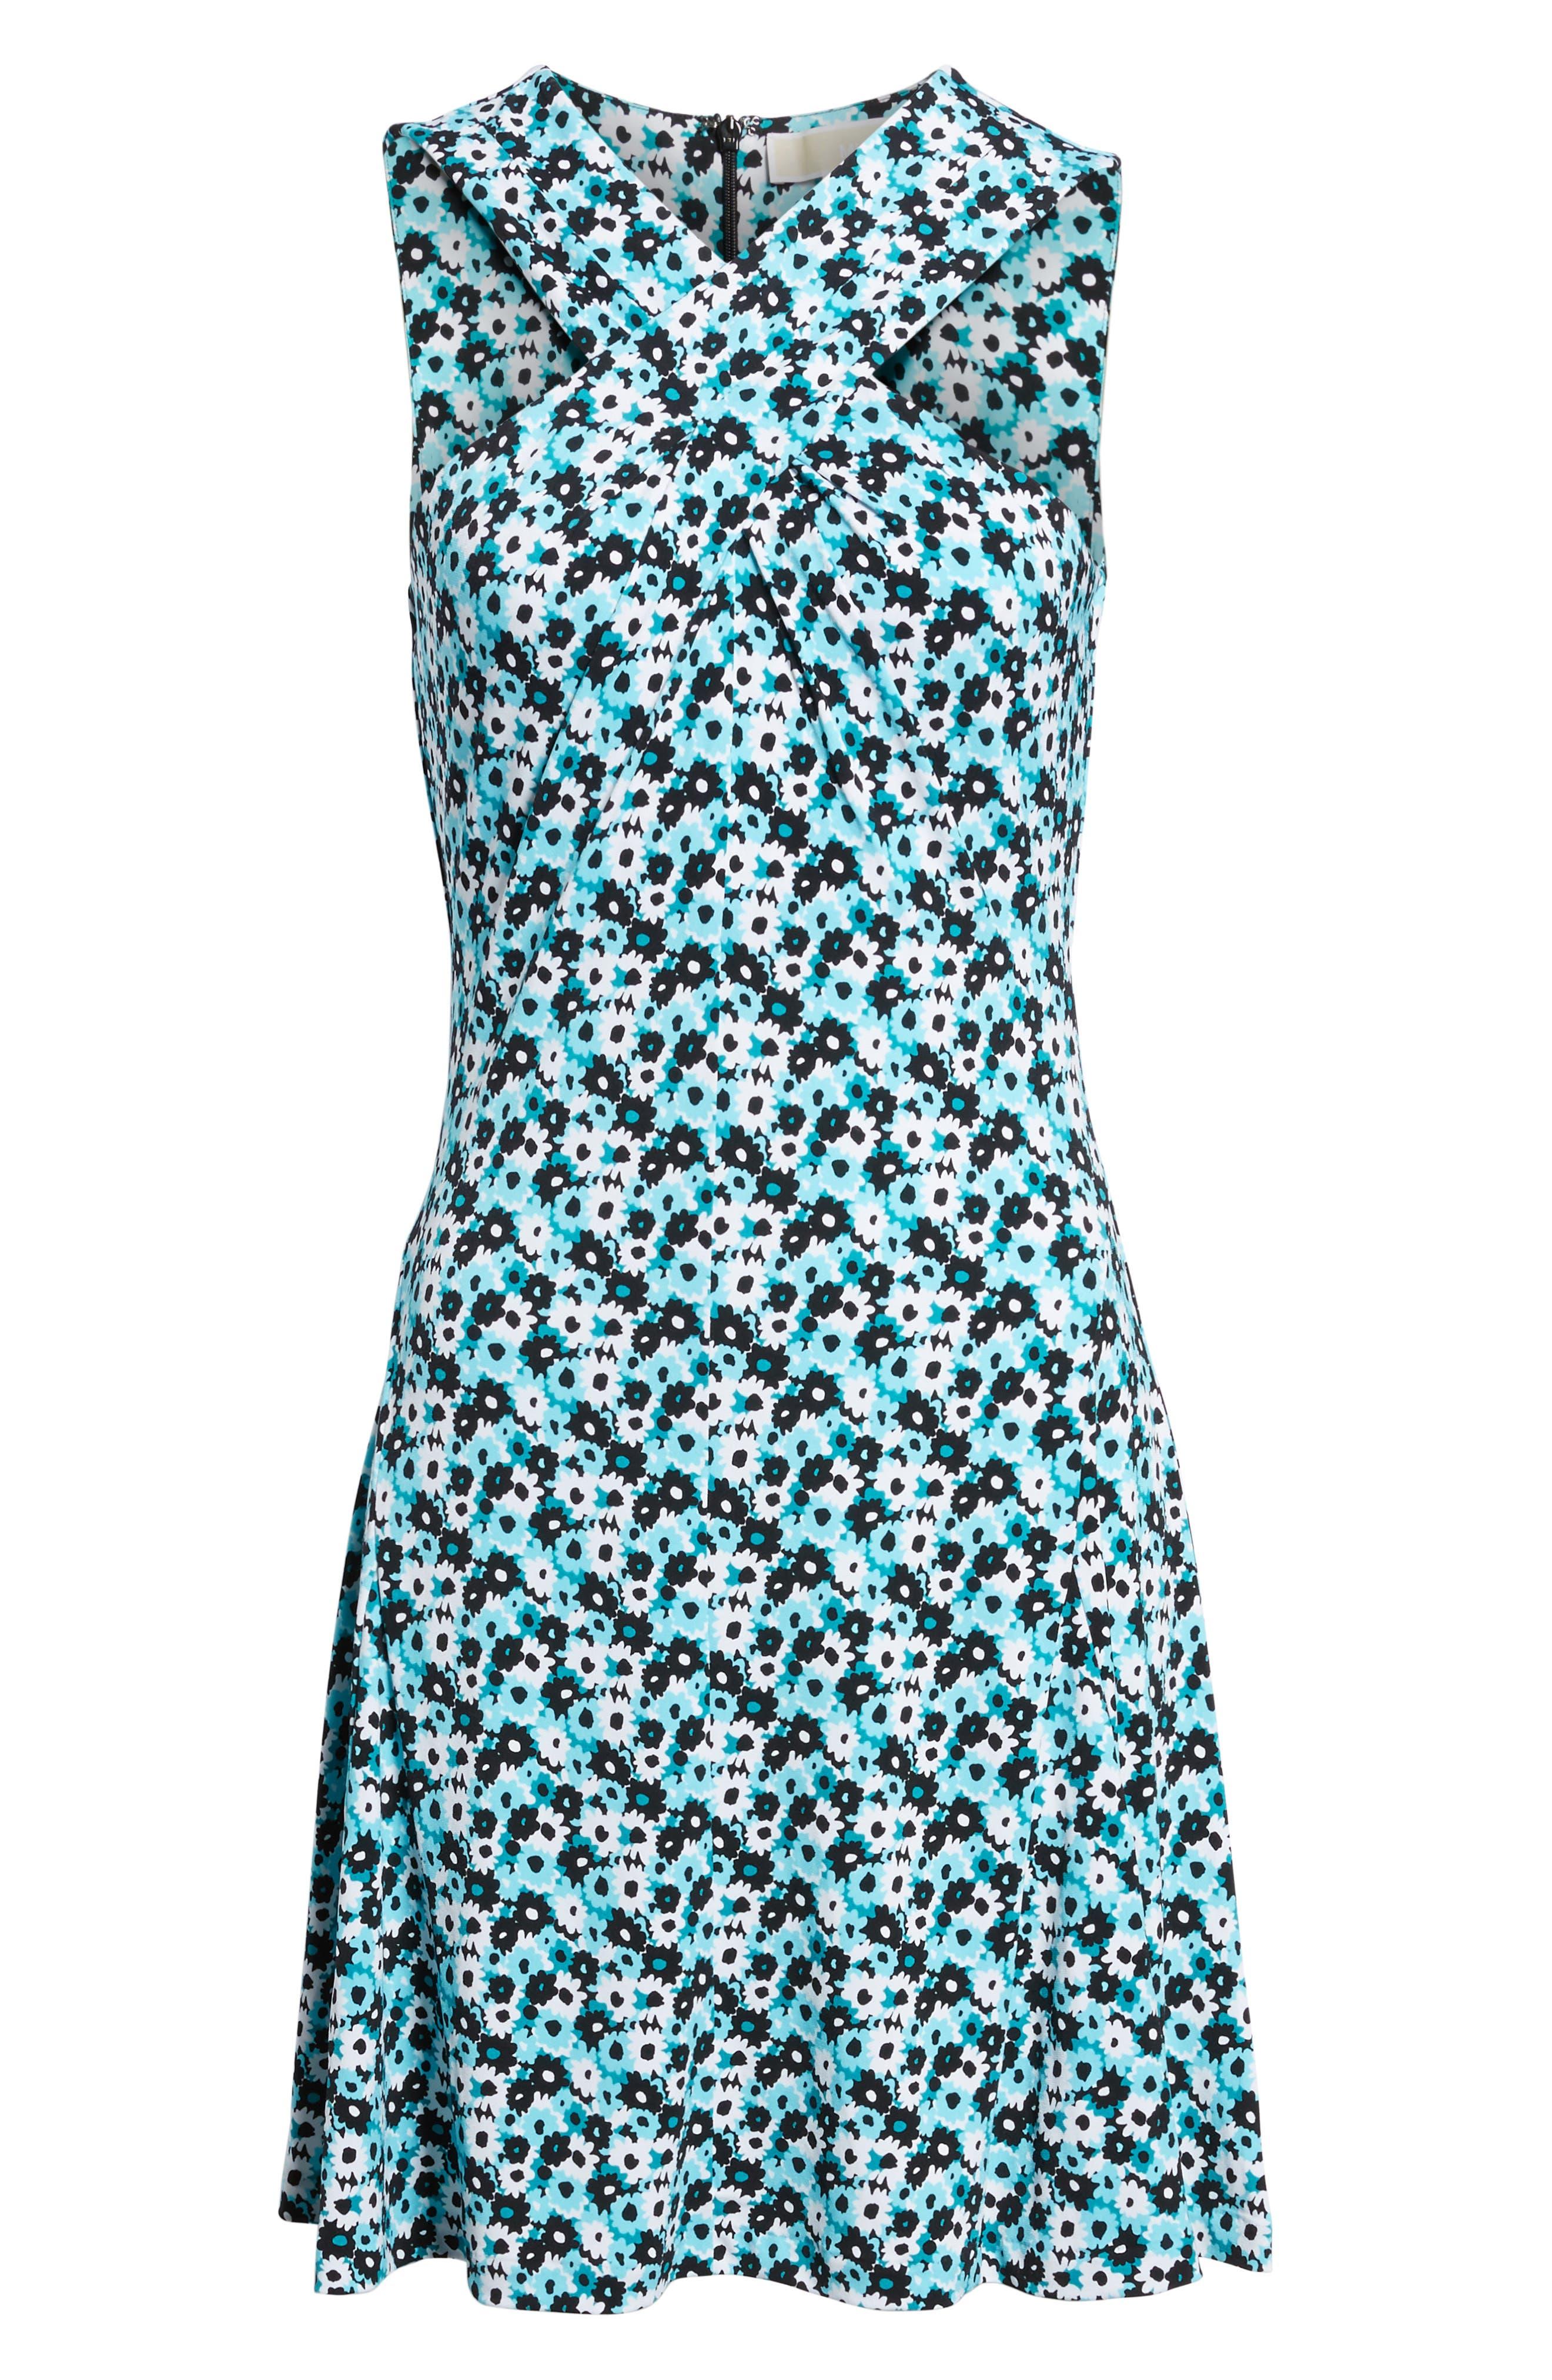 Carnations Cross Neck Fit and Flare Dress,                             Alternate thumbnail 6, color,                             Tile Blue/ Black Multi